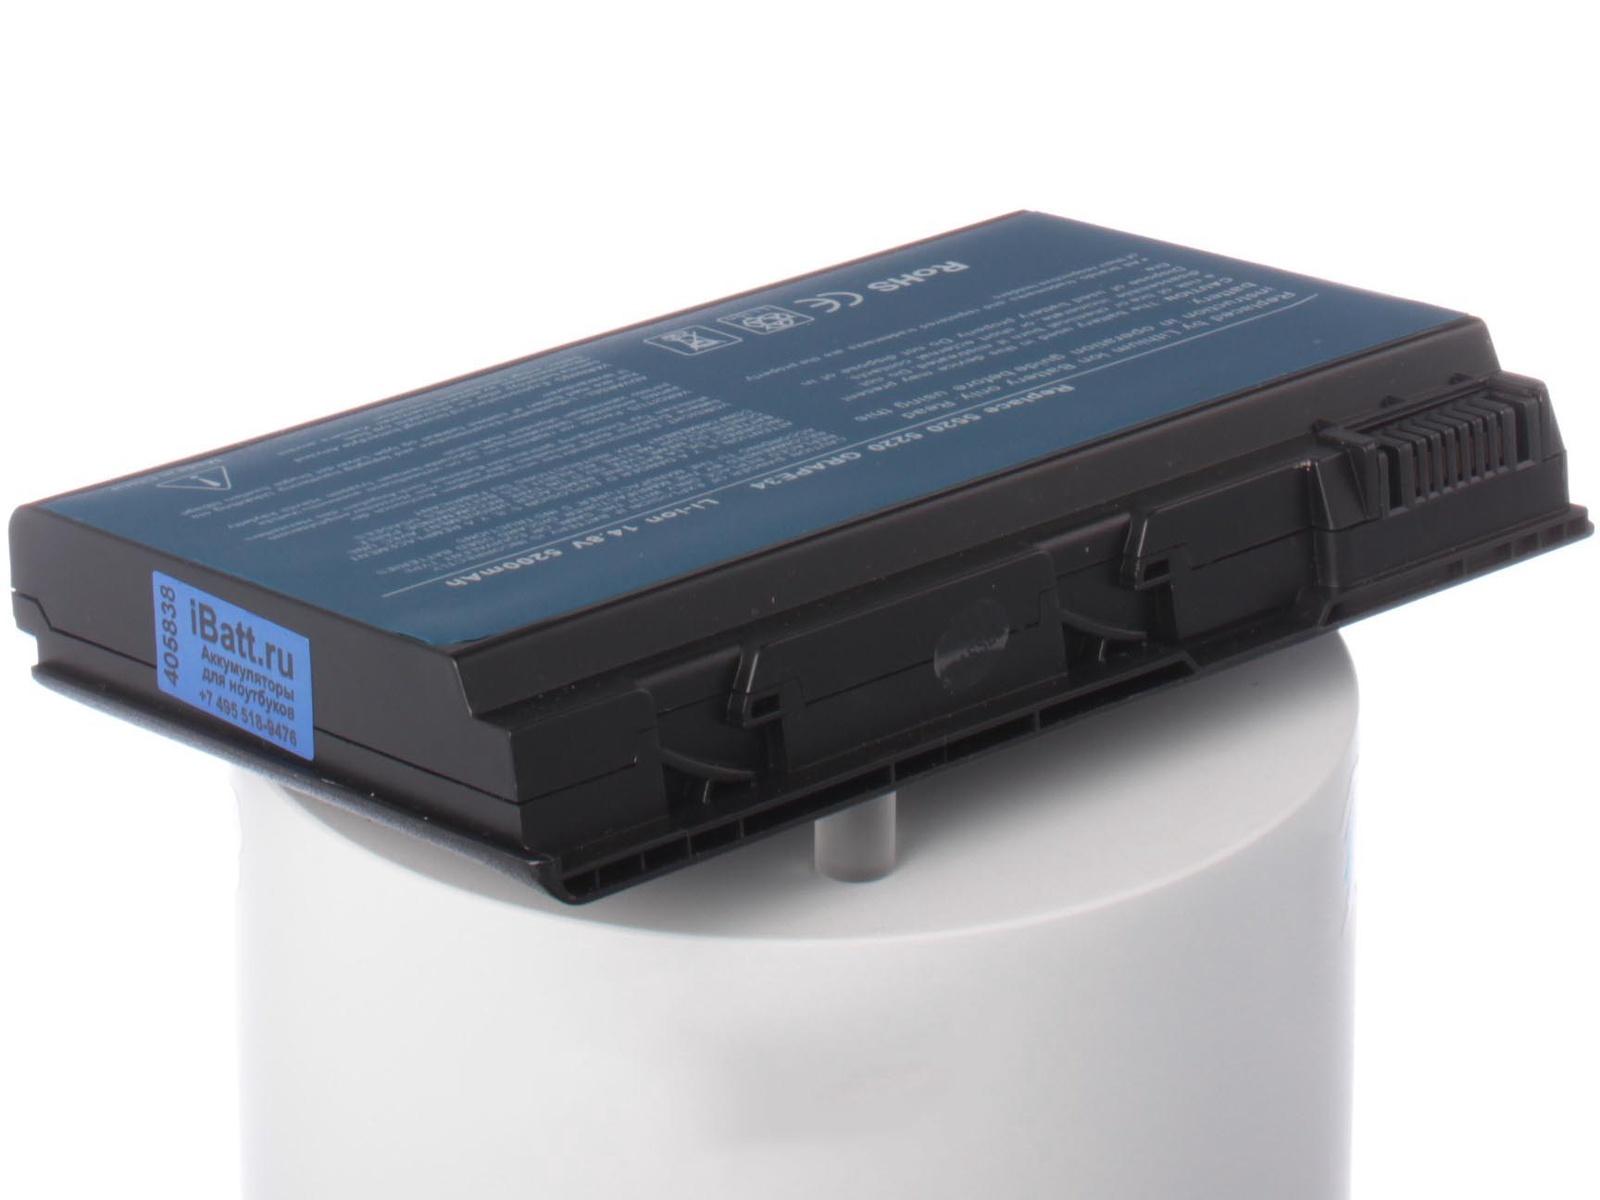 Аккумулятор для ноутбука iBatt для Acer Extensa 5220-301G08Mi, TravelMate 5710, Extensa 5630G-582G25Mi, Extensa 5120, Extensa 5620G-2A2G25Mi, Travelmate 5720G-812G25Mi, TravelMate 720, TravelMate 5320-101G12Mi